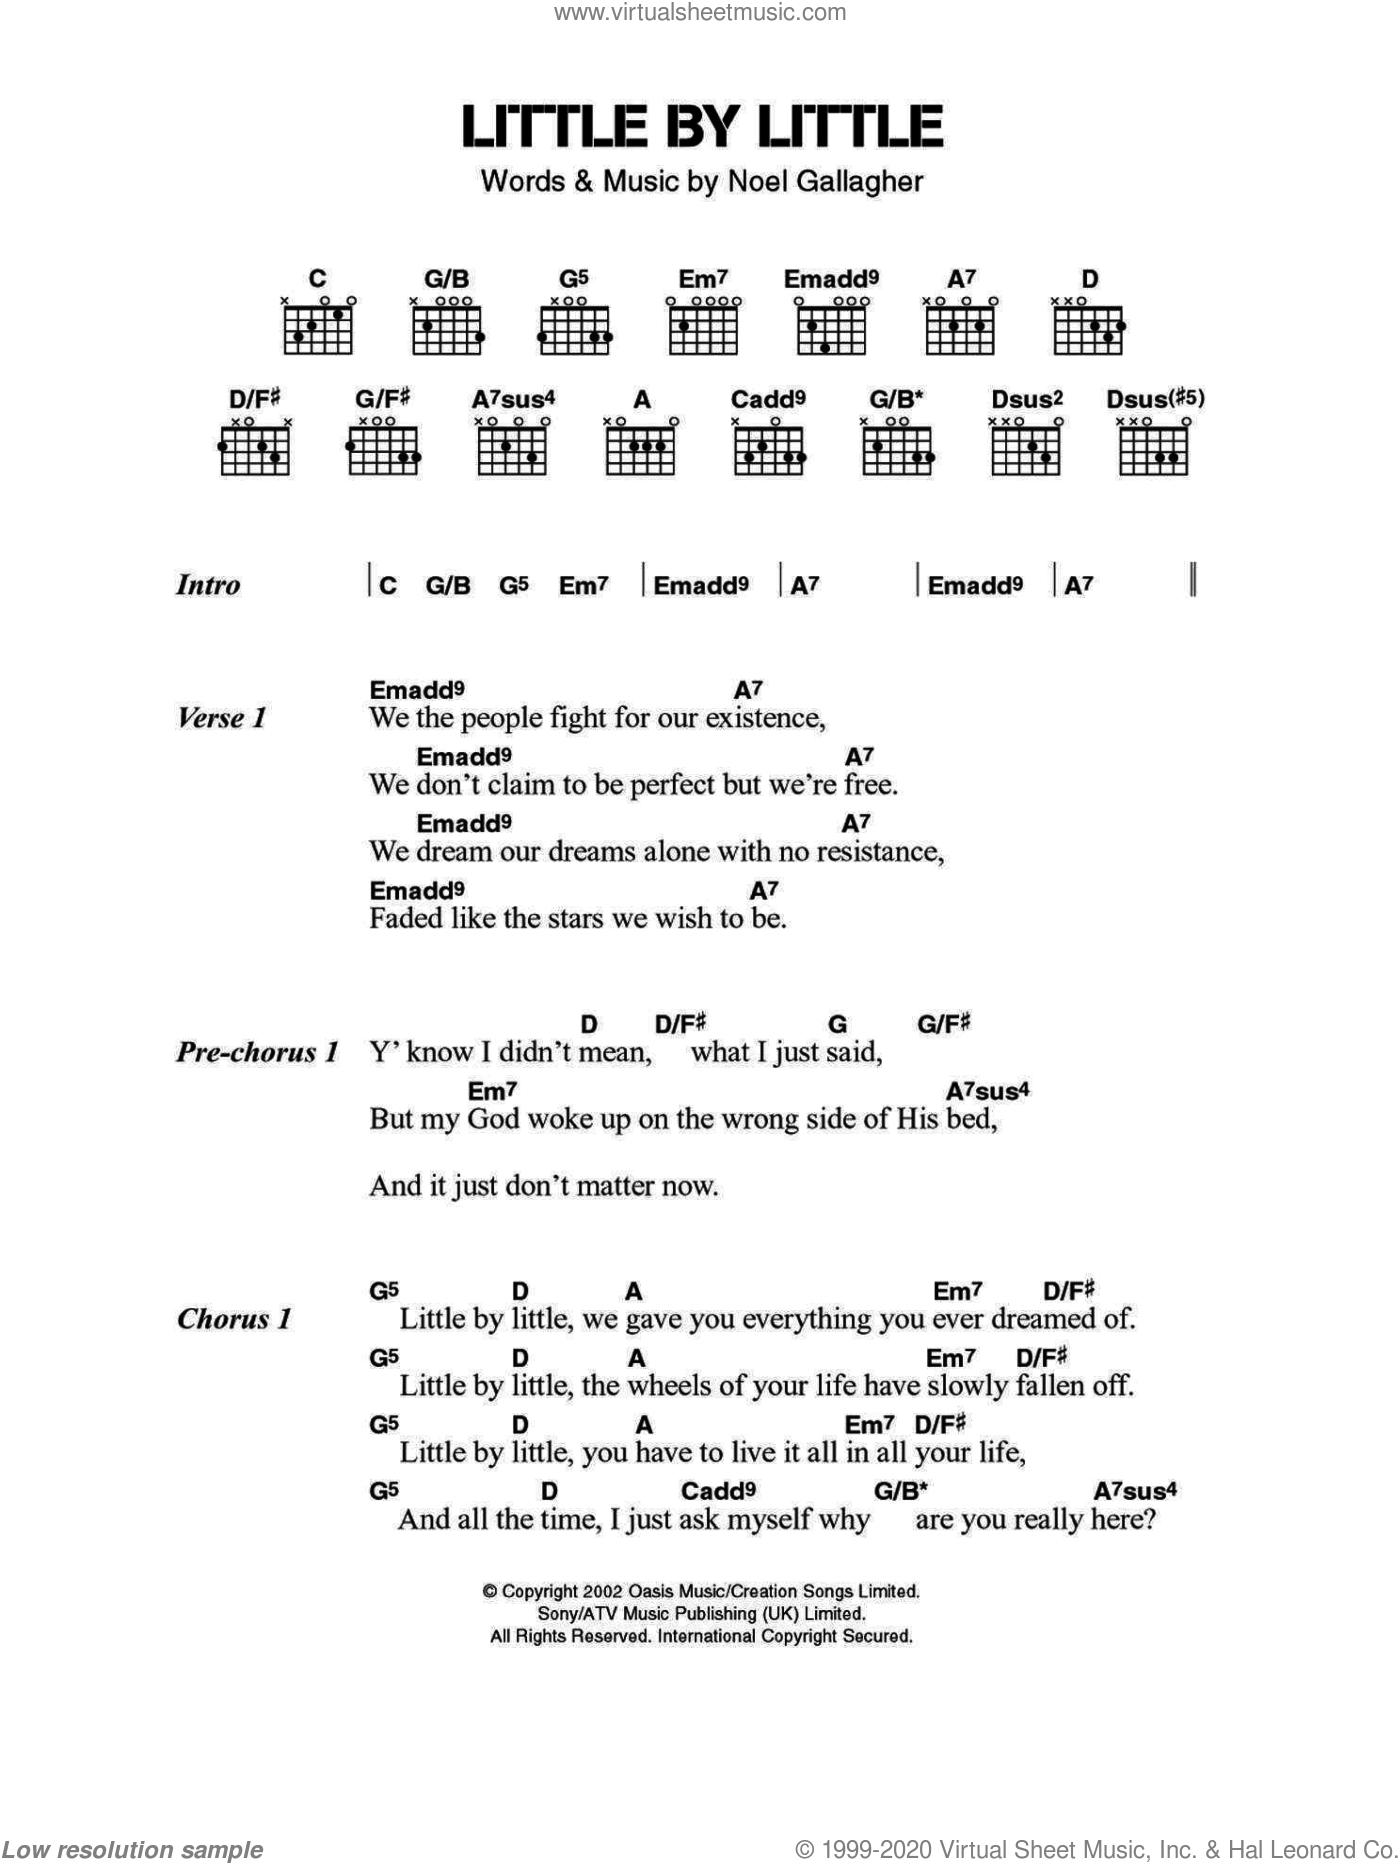 Oasis - Little By Little sheet music for guitar (chords) v2